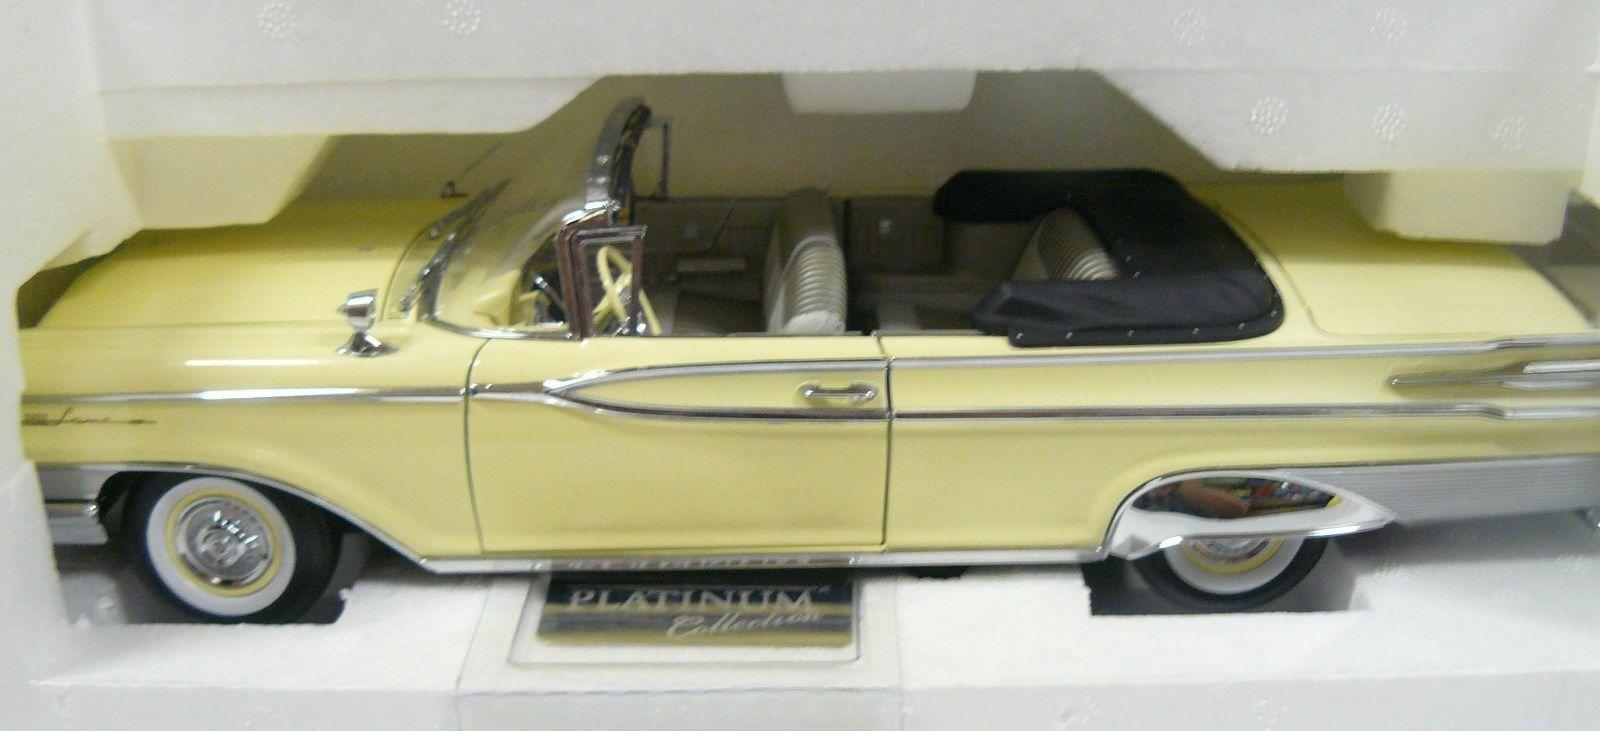 1 18 1959 Mercury Parklane open congreenible , in the box